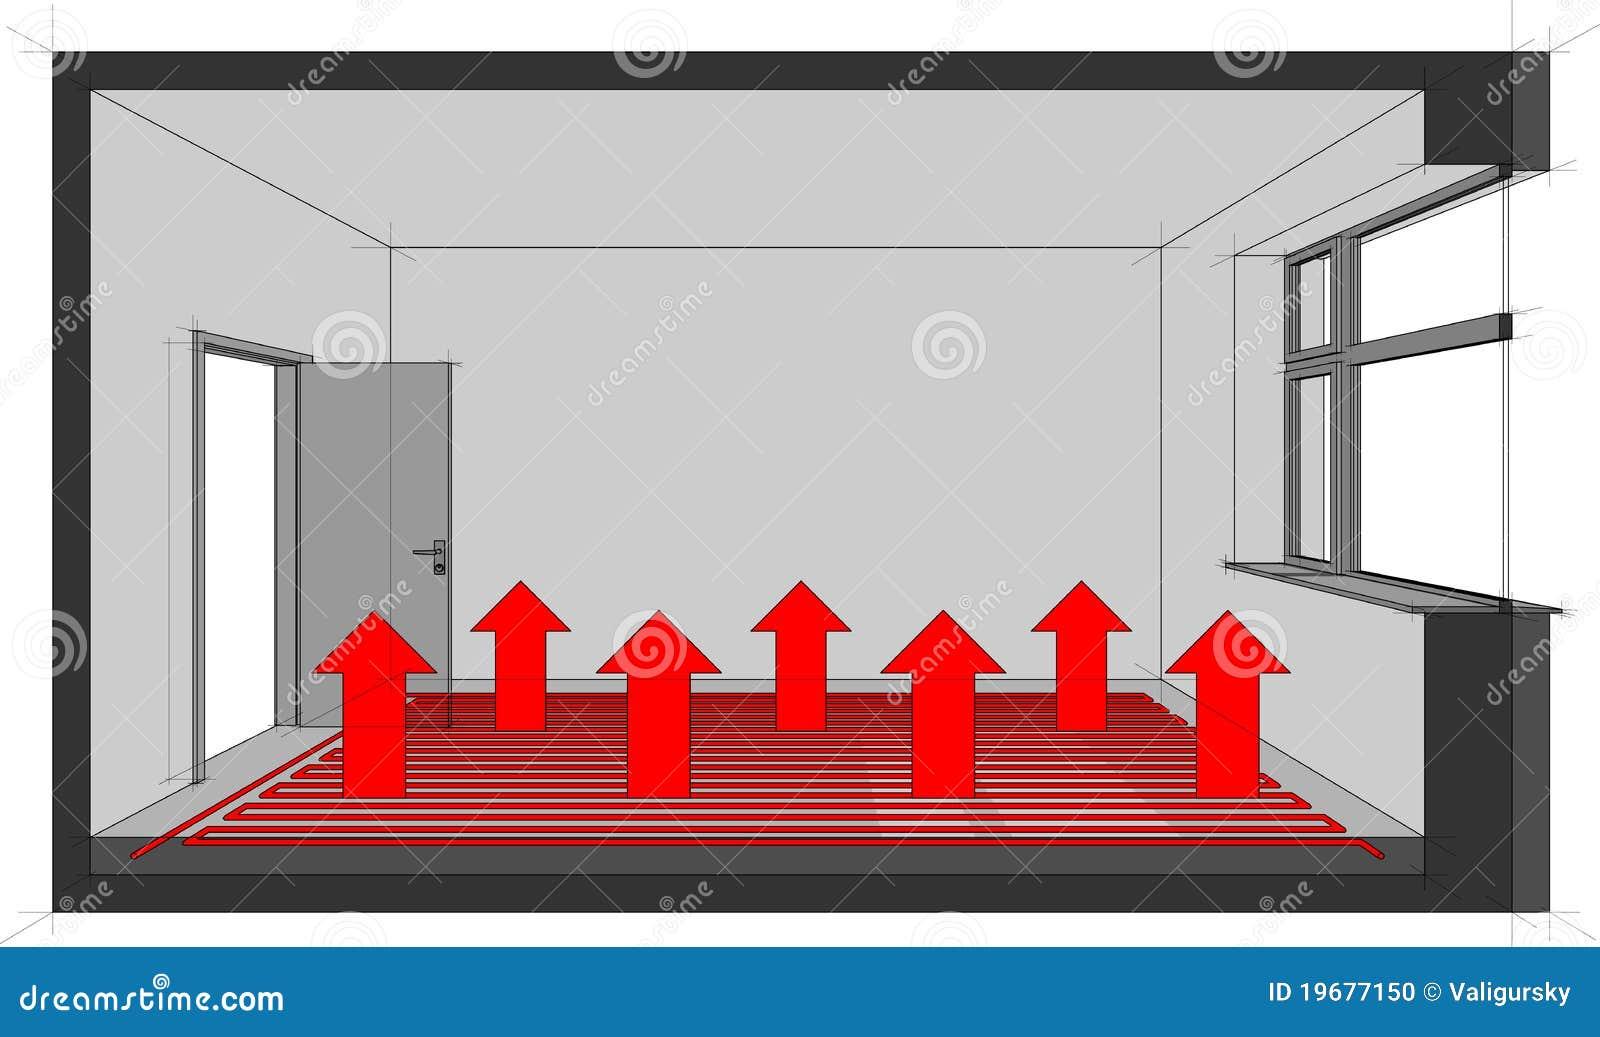 Underfloor Heating Diagram Stock Photo